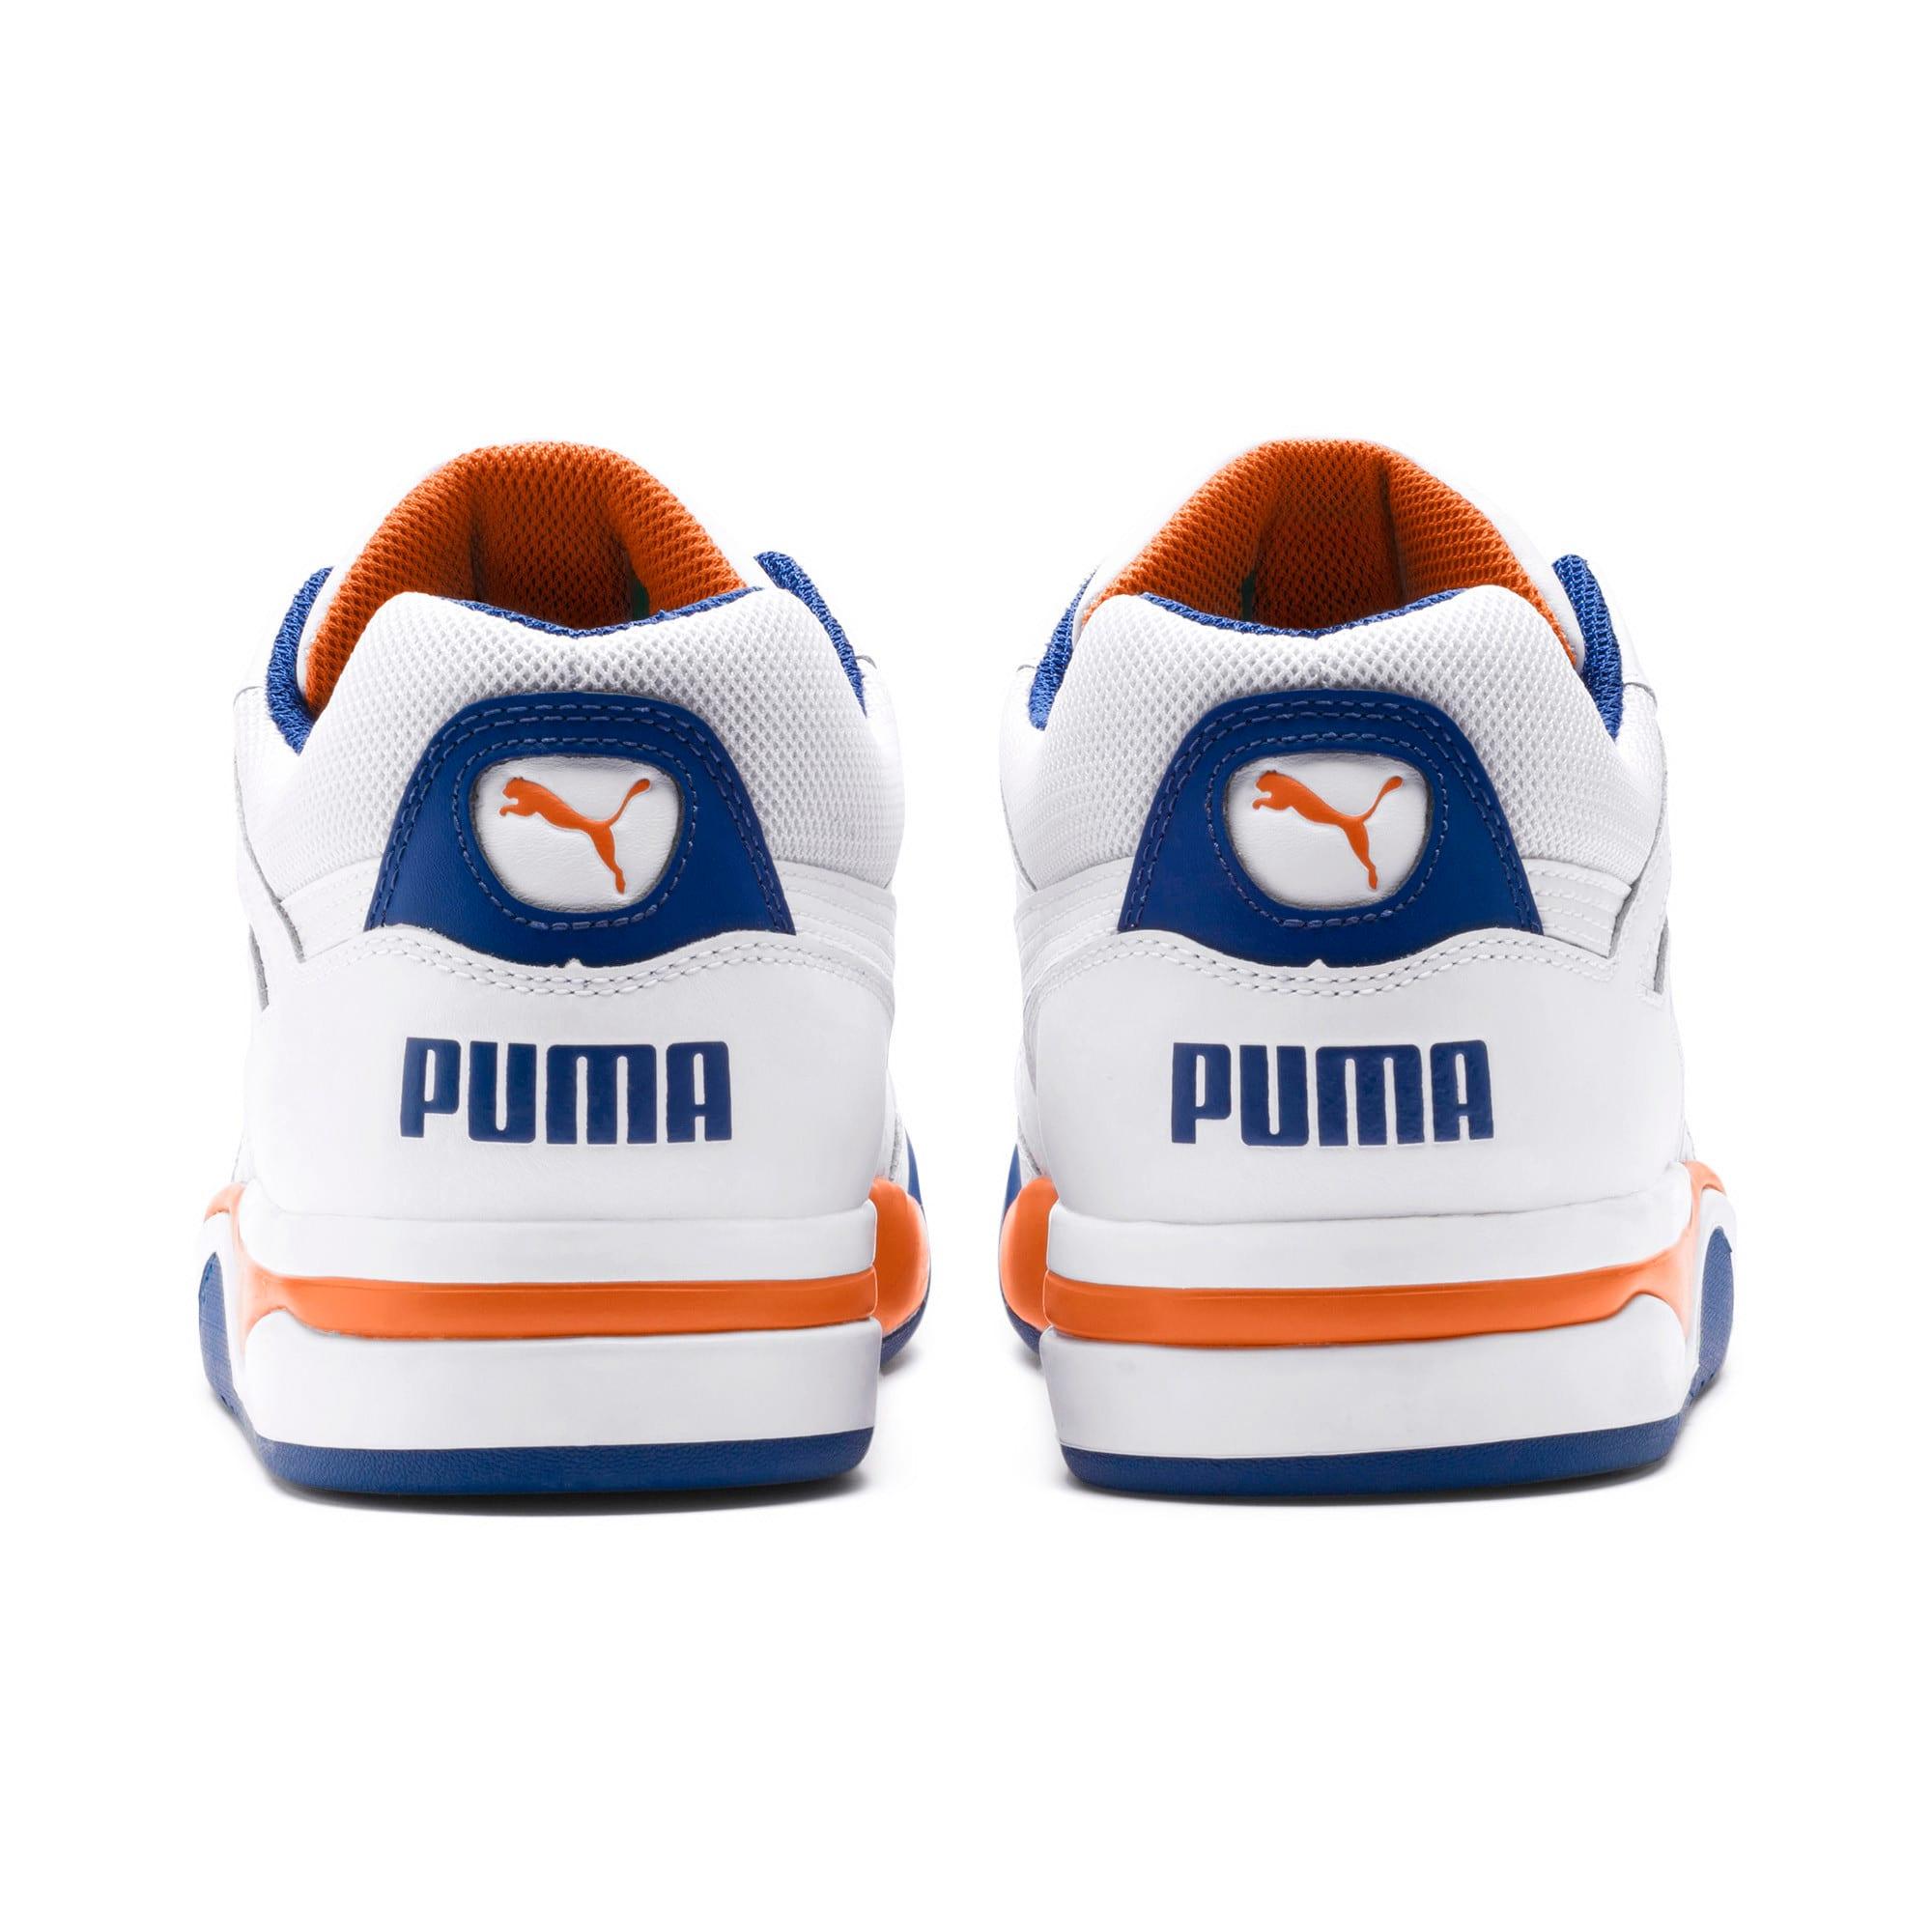 Thumbnail 3 of Palace Guard basketbalschoenen voor heren, P White-Jaffa Orange-G Blue, medium